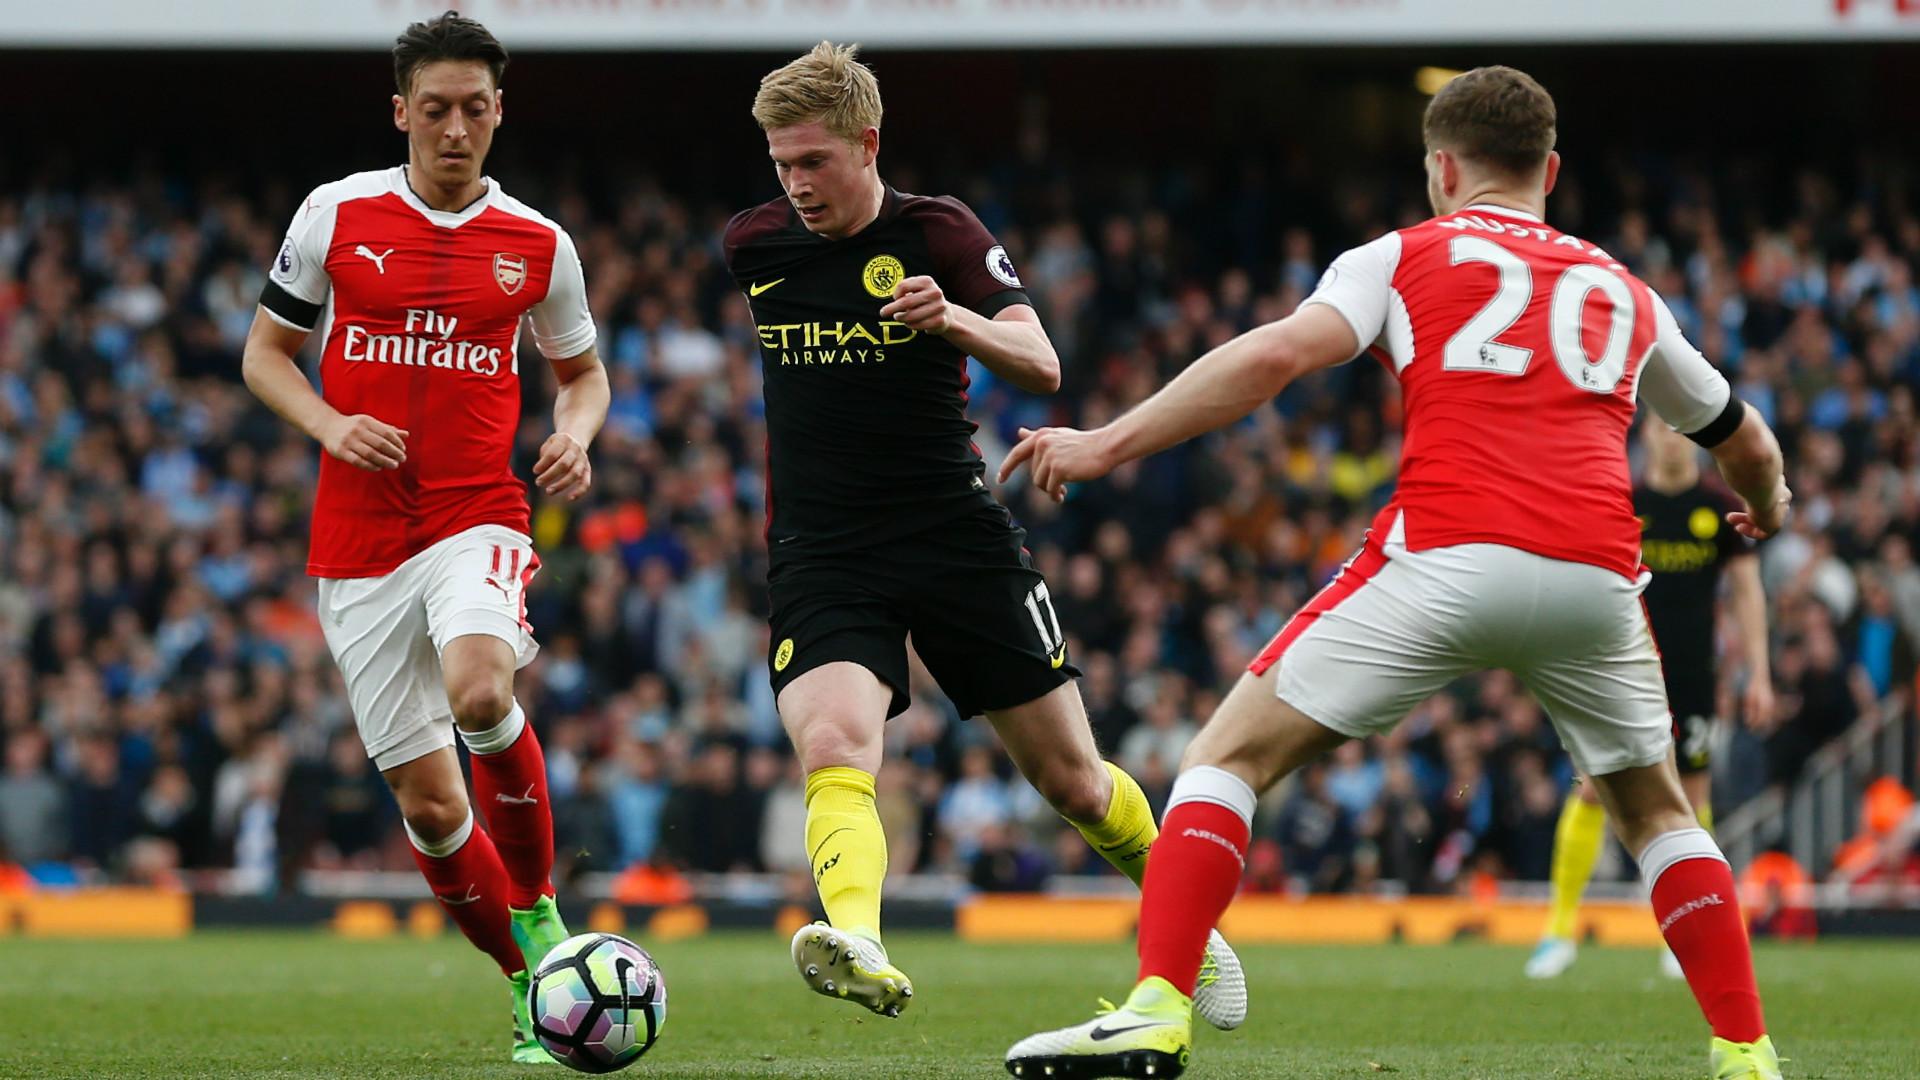 Kevin De Bruyne Mesut Ozil Shkodran Mustafi Arsenal Manchester City Premier League 02042017